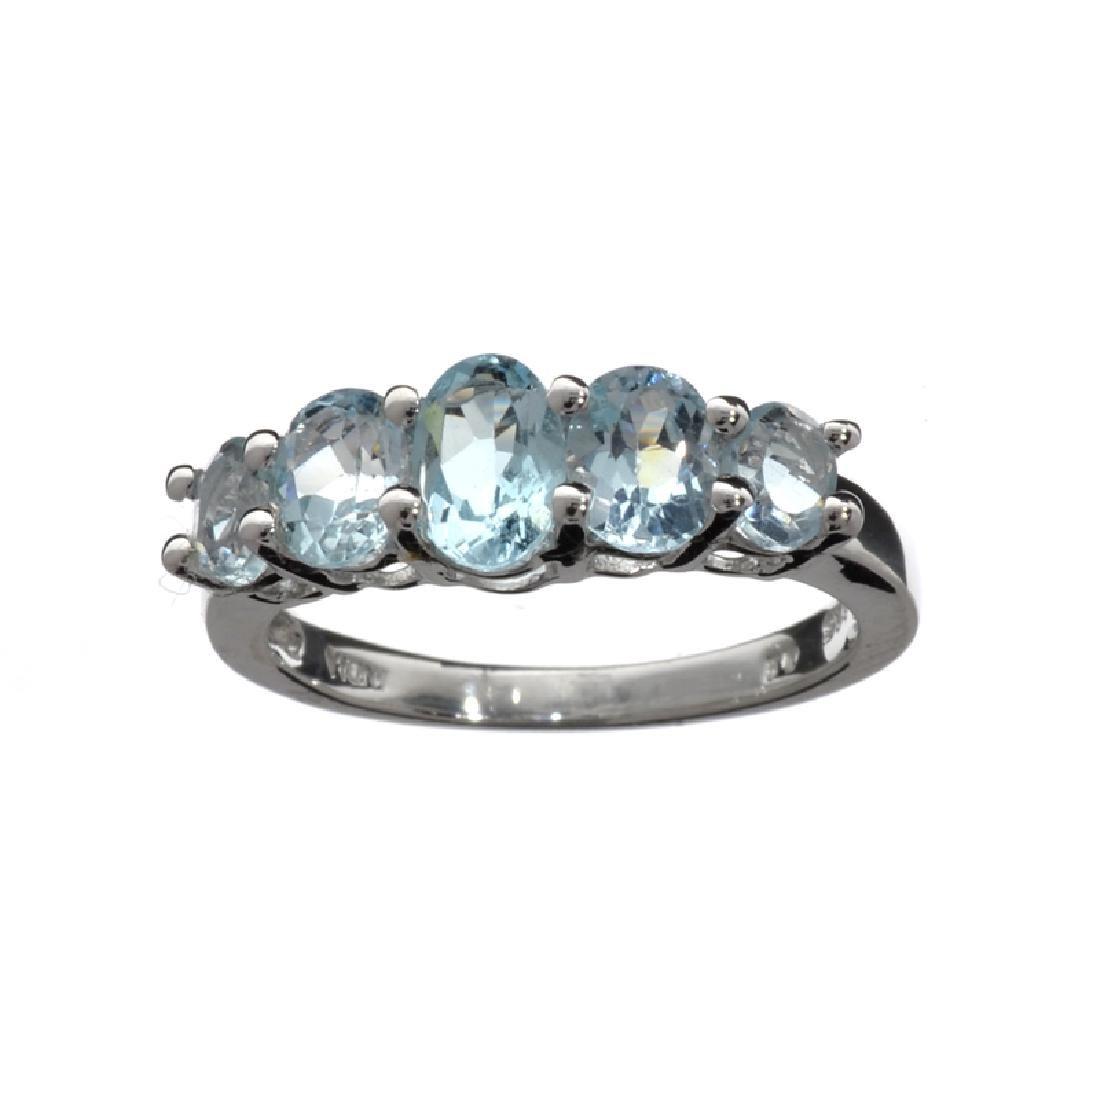 APP: 0.5k Fine Jewelry 1.75CT Oval Cut Blue Topaz And